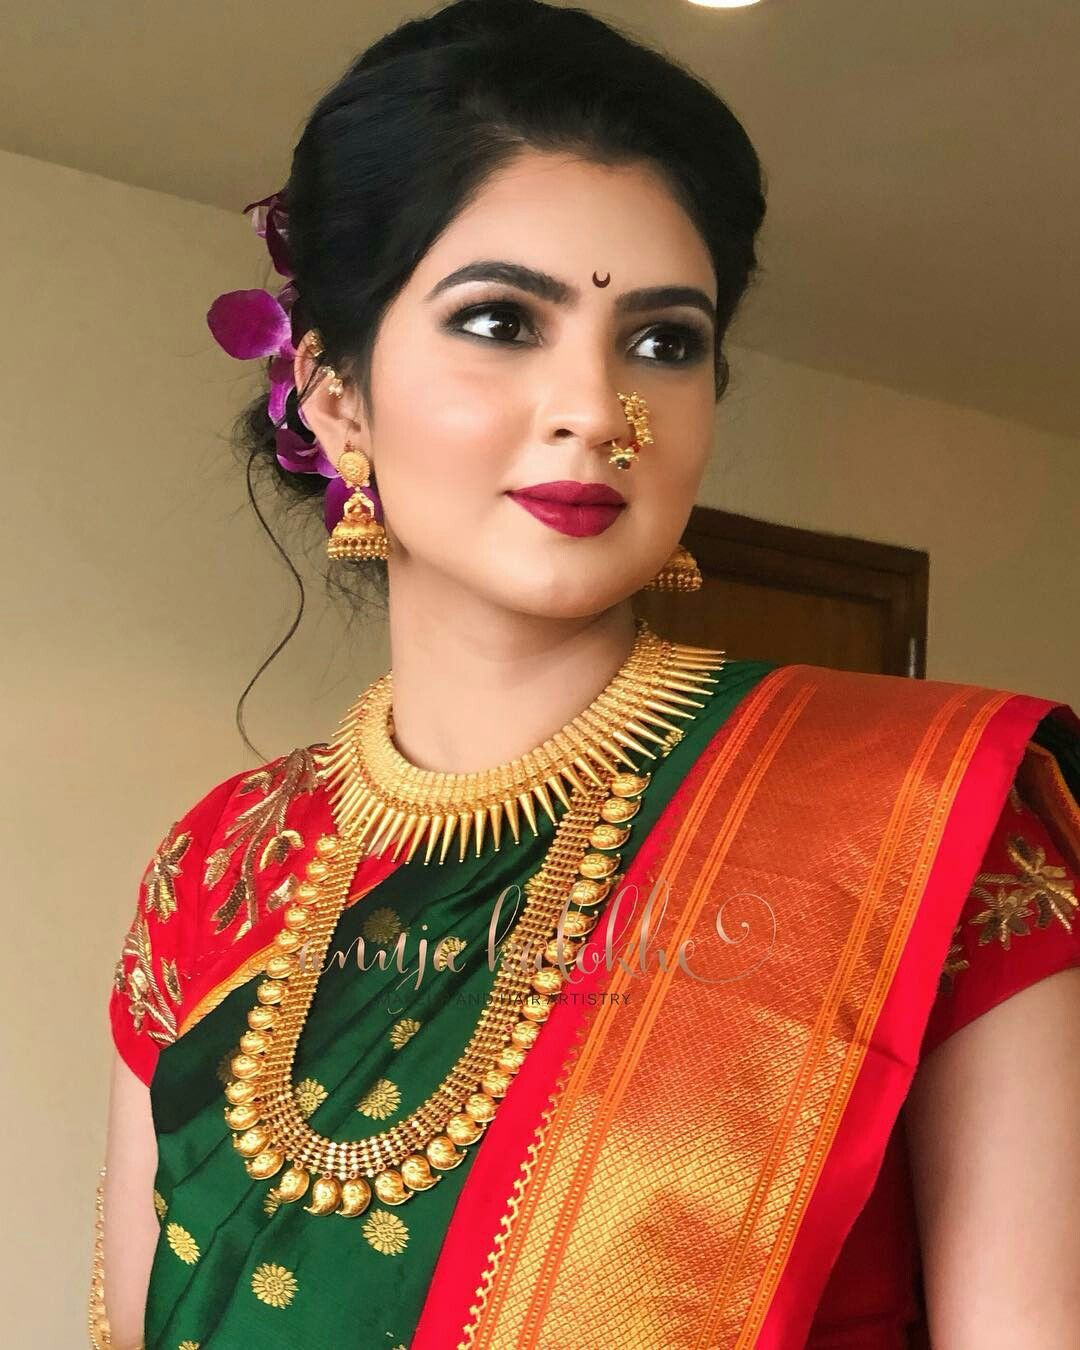 Pin By Ayu Sari On Ruchi Designs: Saree Wedding, Indian